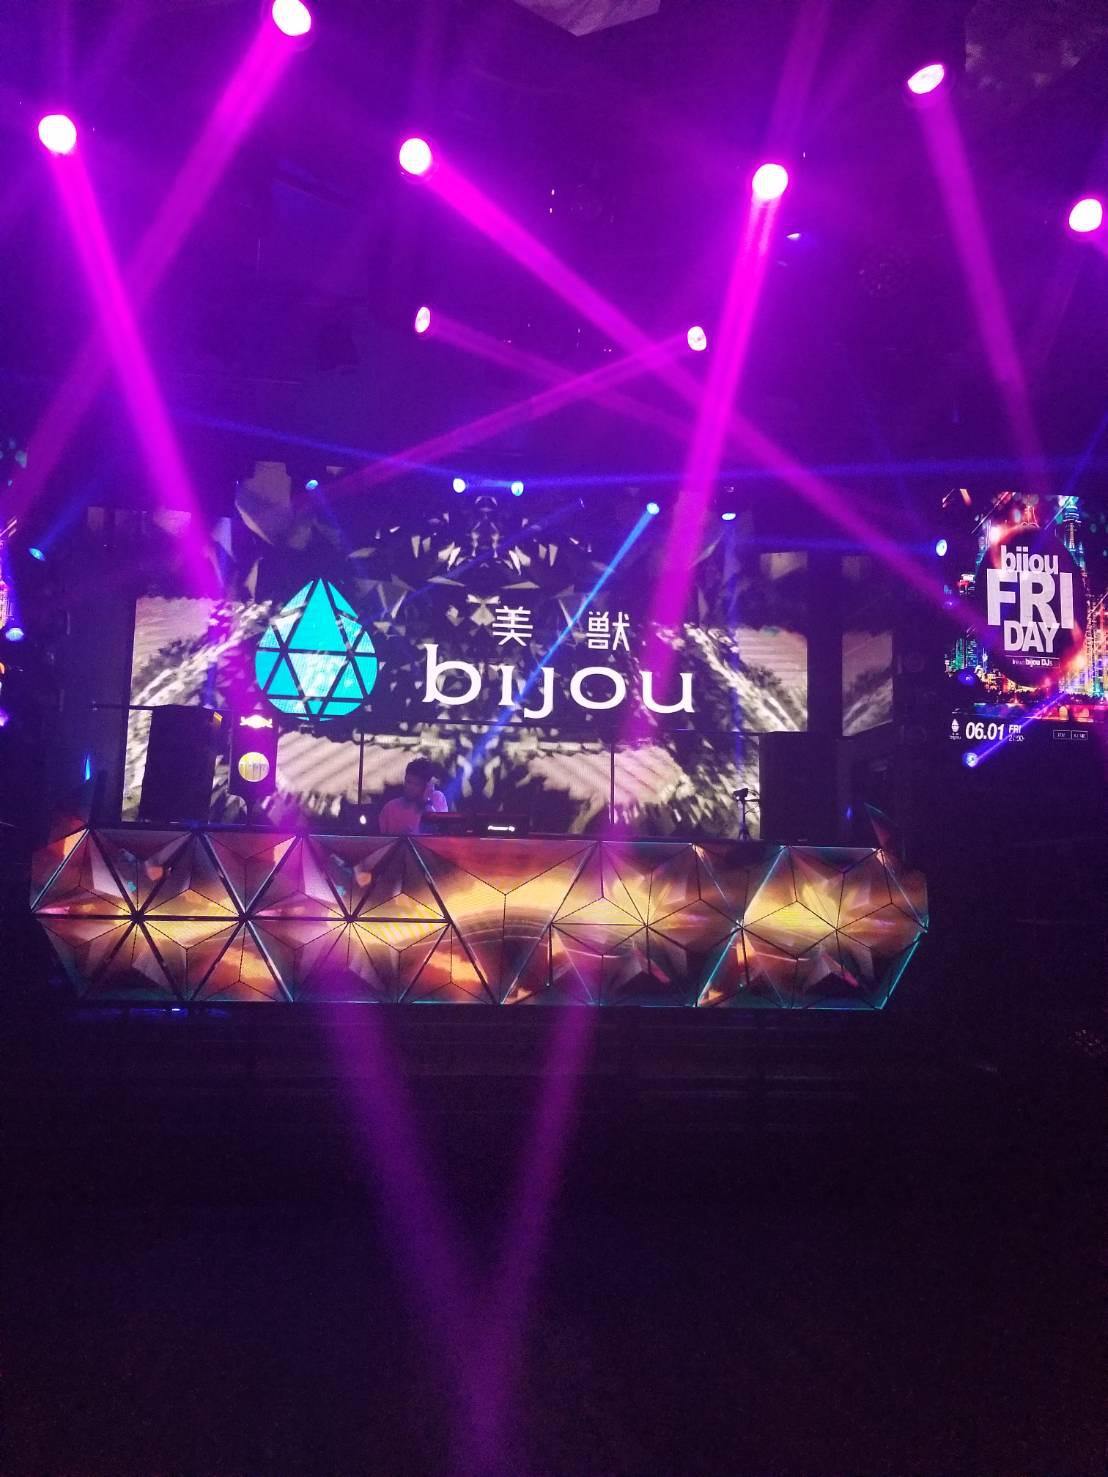 bijou-美獣- 中洲の夜は踊るクラブで盛り上がろう!